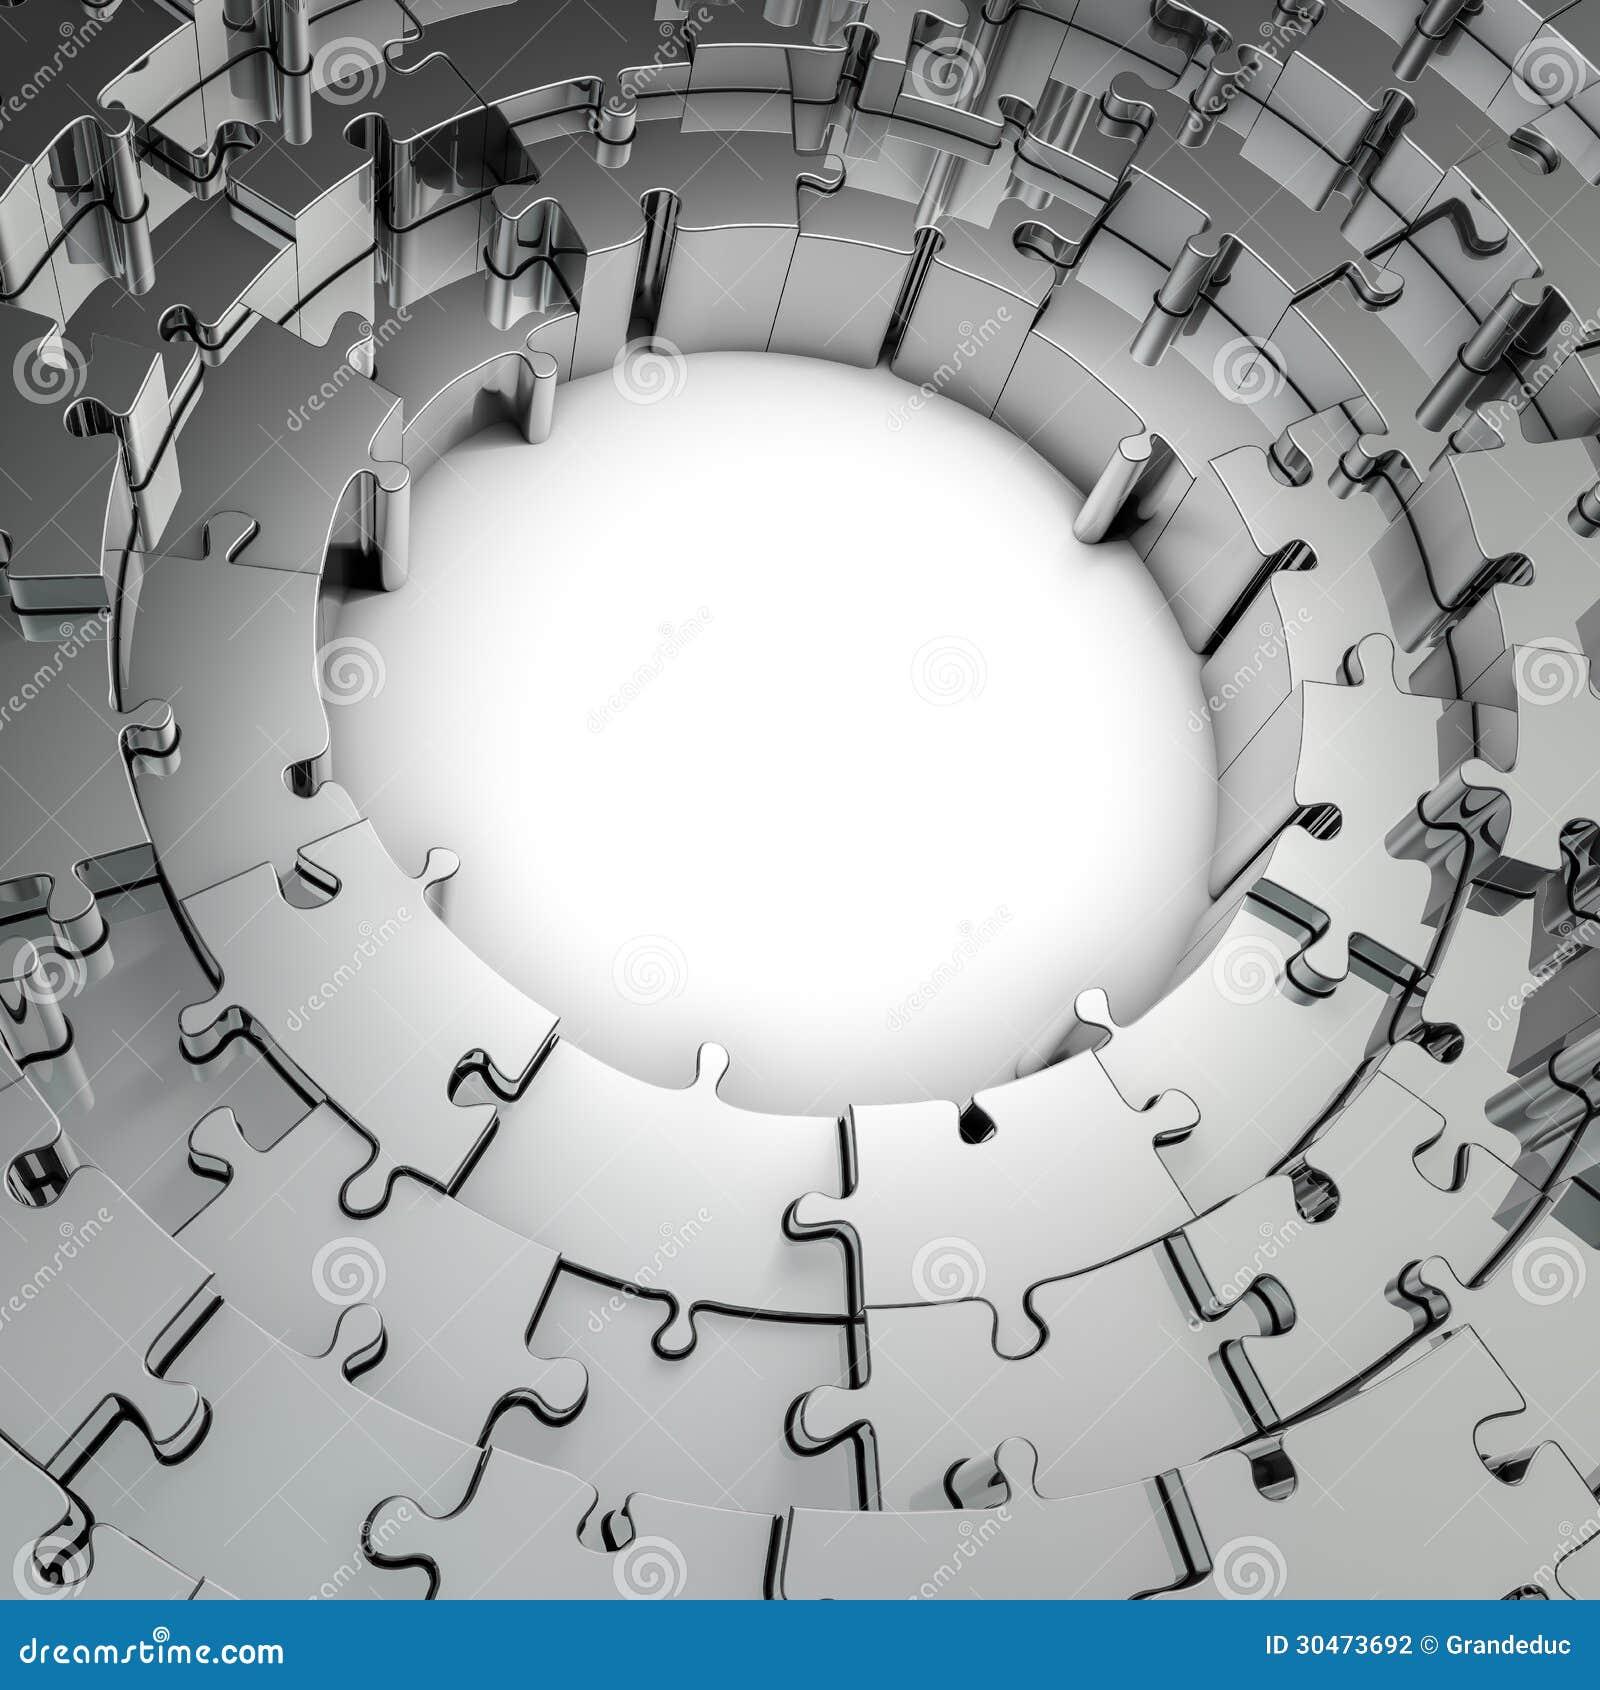 Metal puzzle frame stock illustration. Illustration of business ...